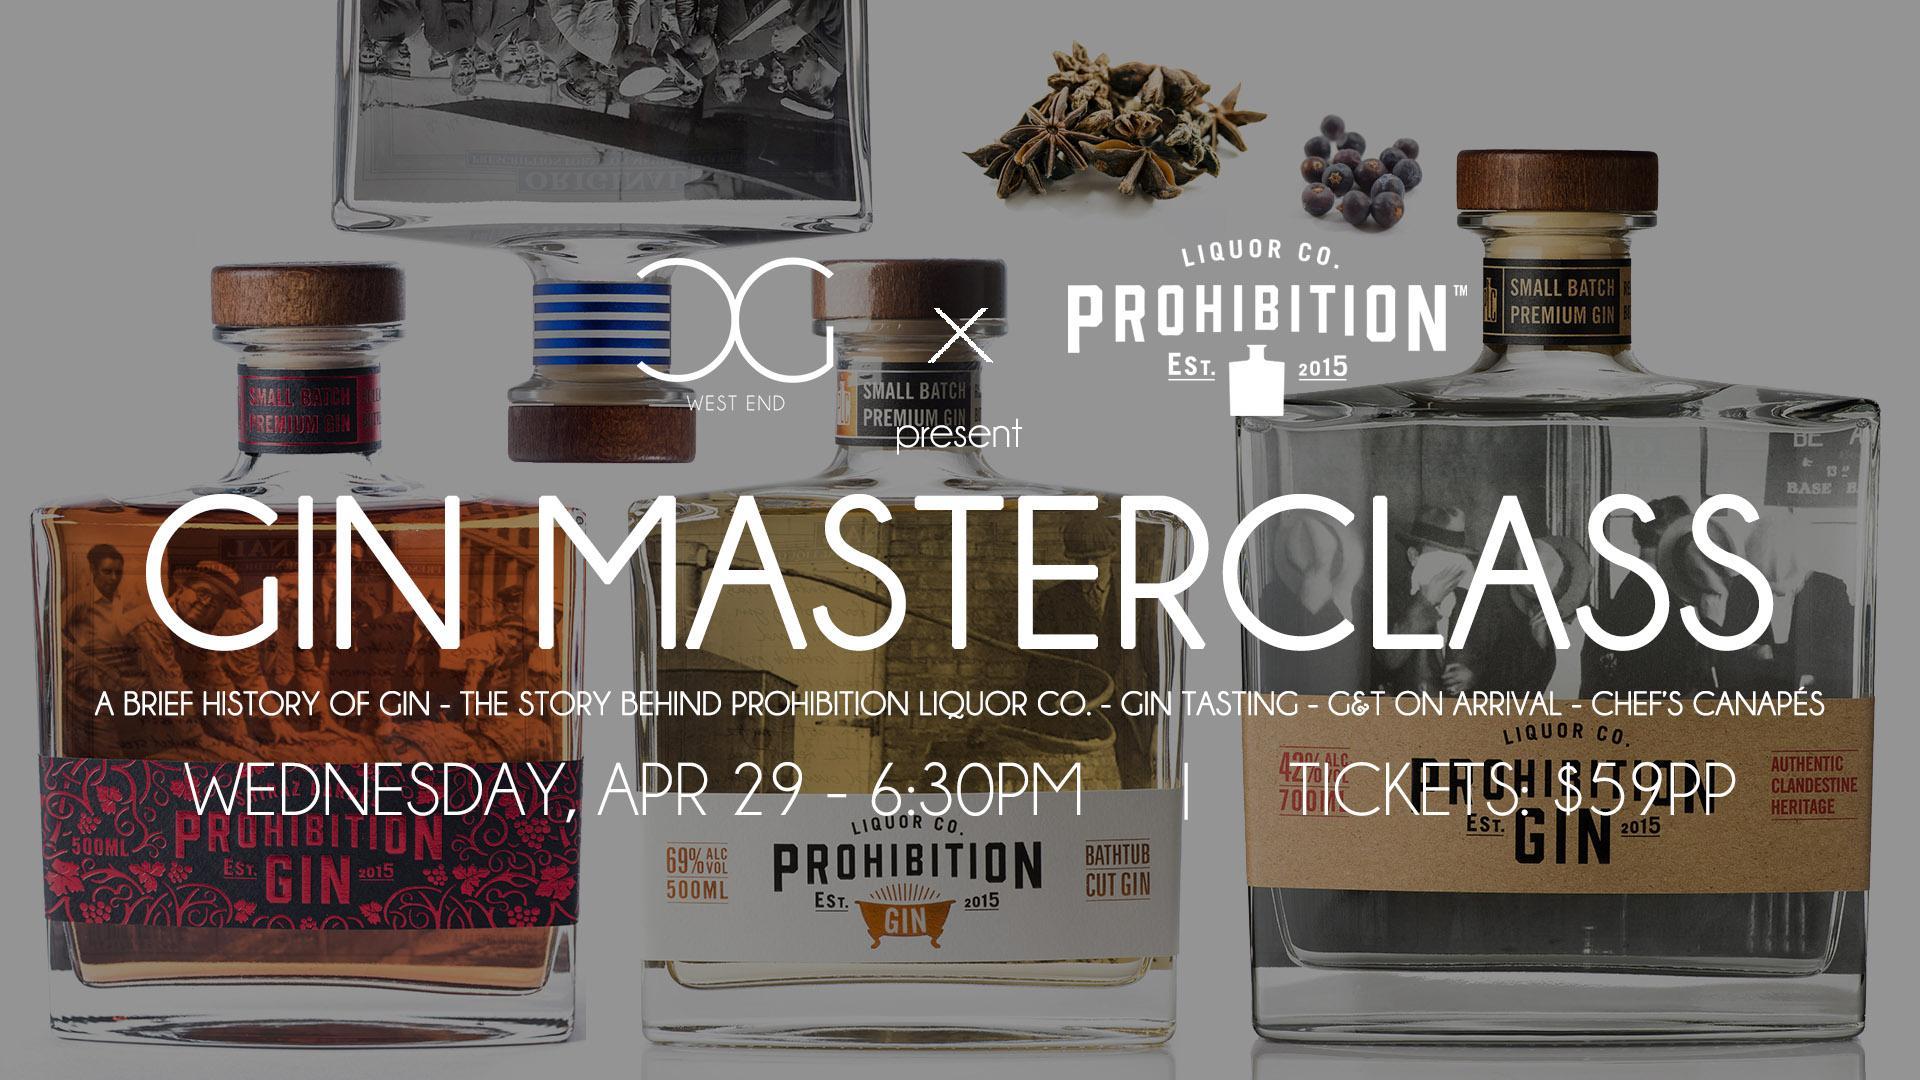 Gin Masterclass - presented by Prohibition Liquor Co.